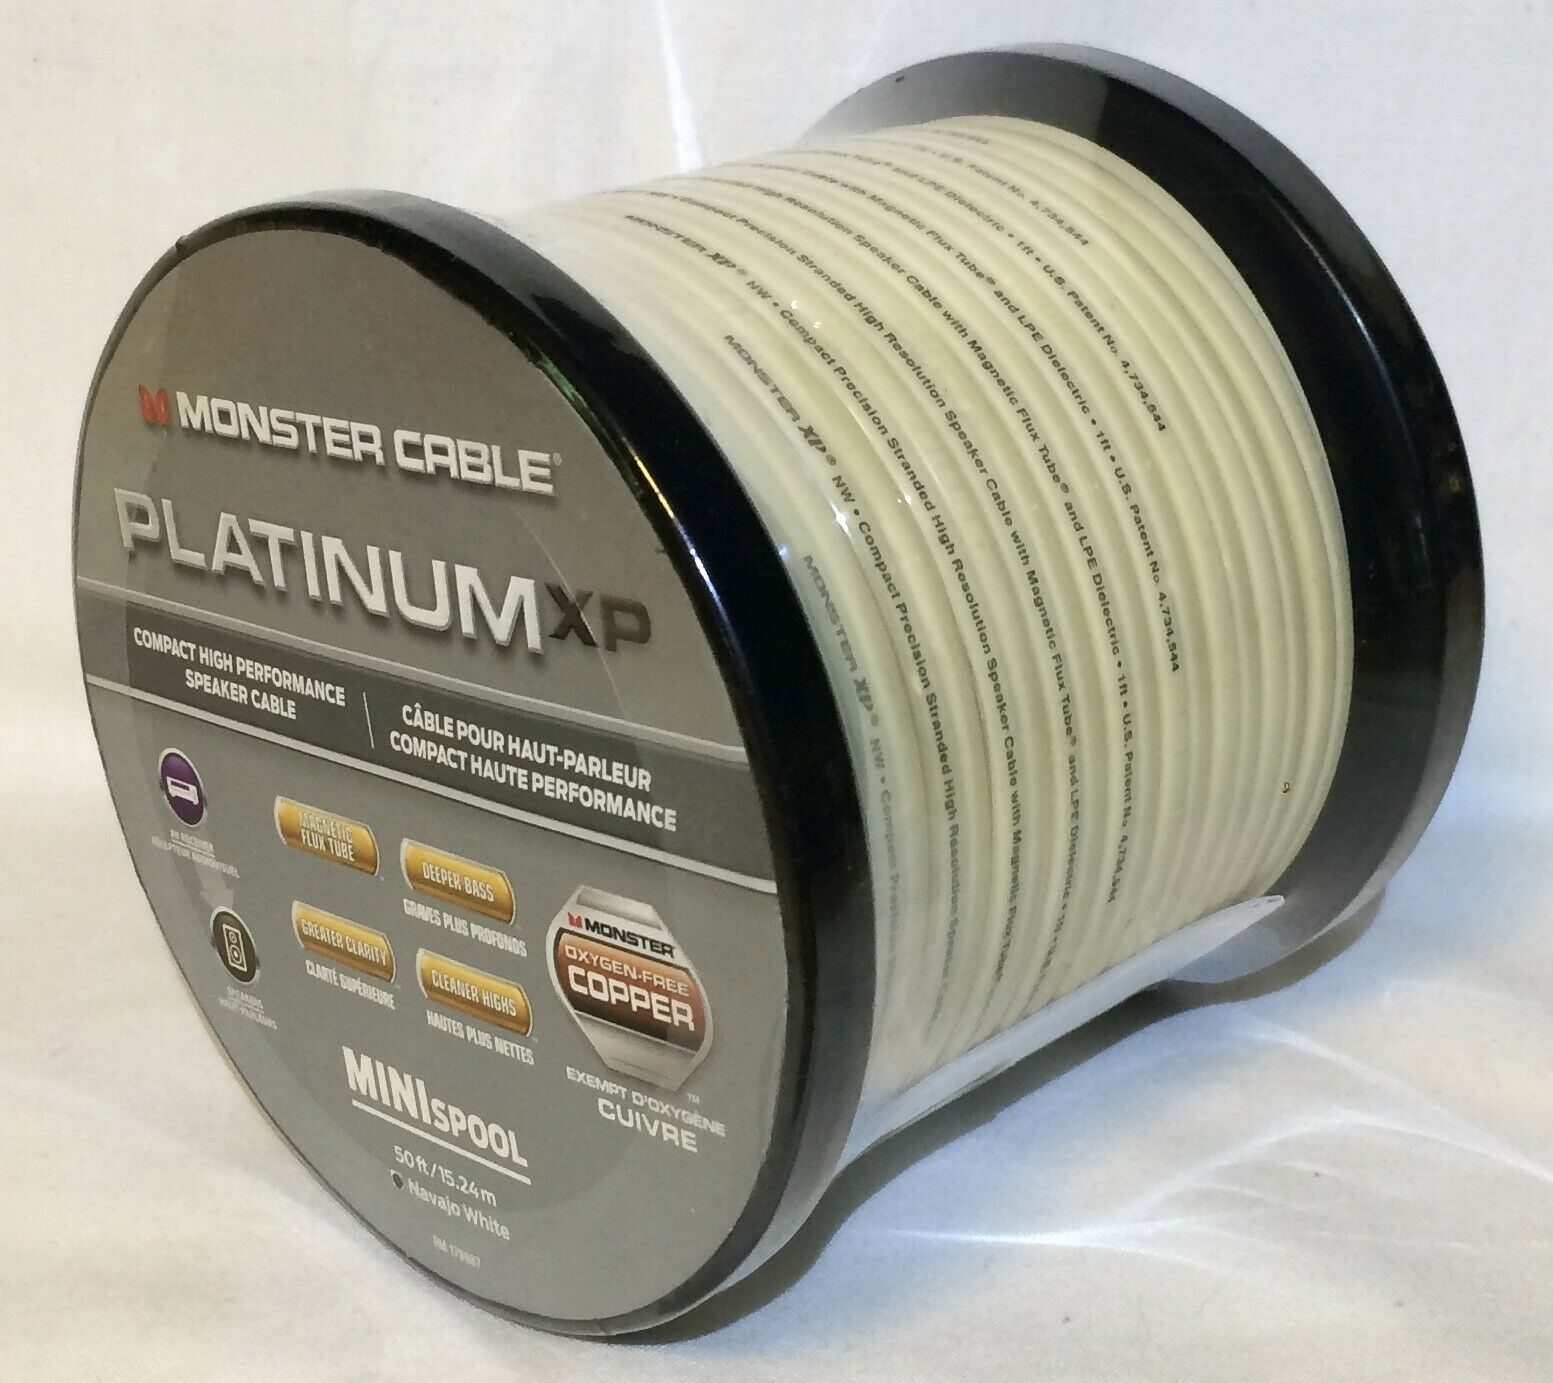 Monster Cable MC PLAT XPNWMS-50 WW Platinum XP Navajo White